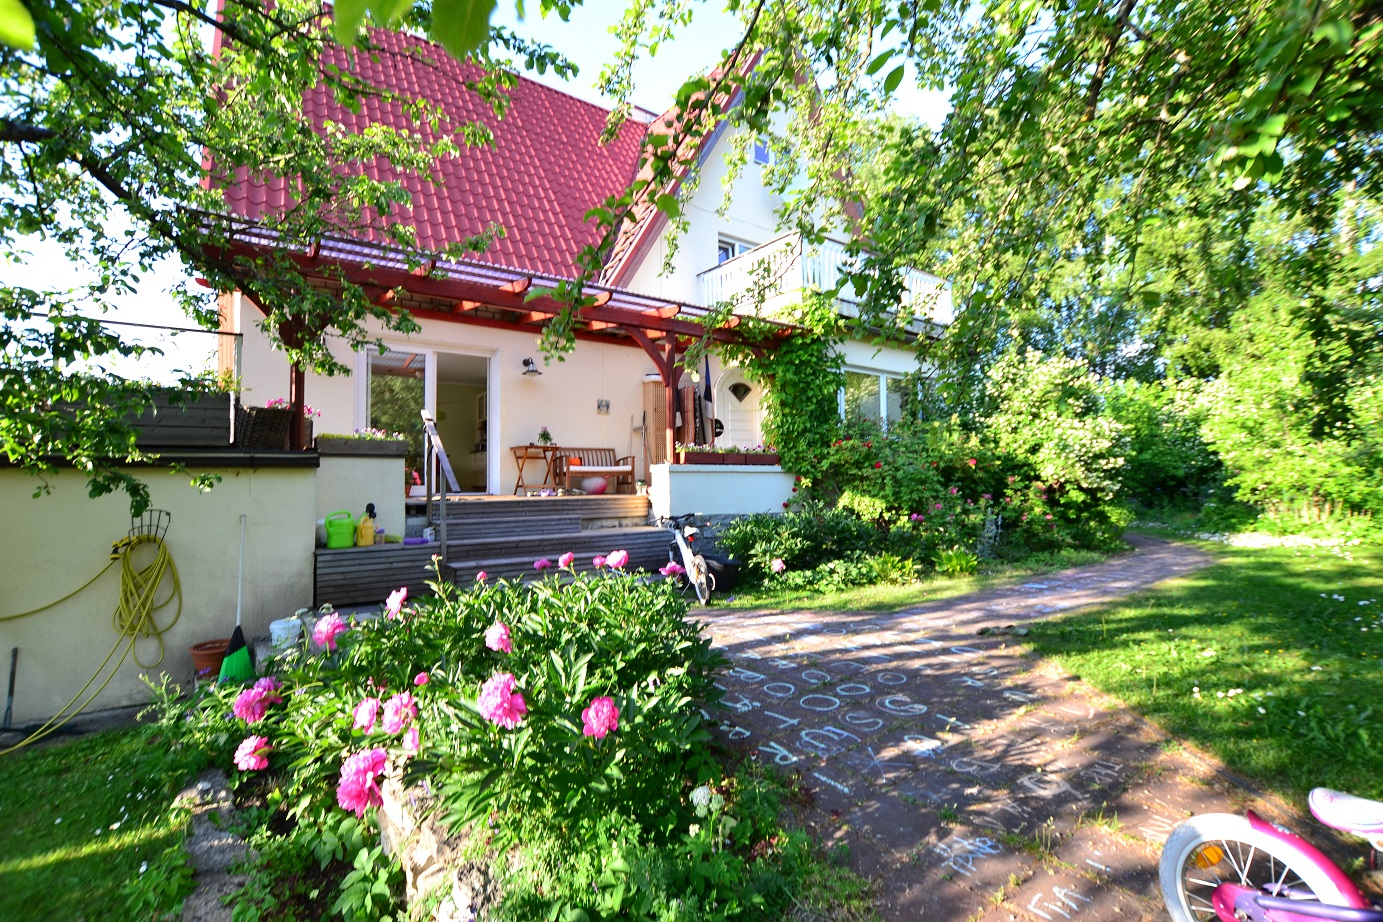 Saare 20, Pirita, Tallinn, Harjumaa